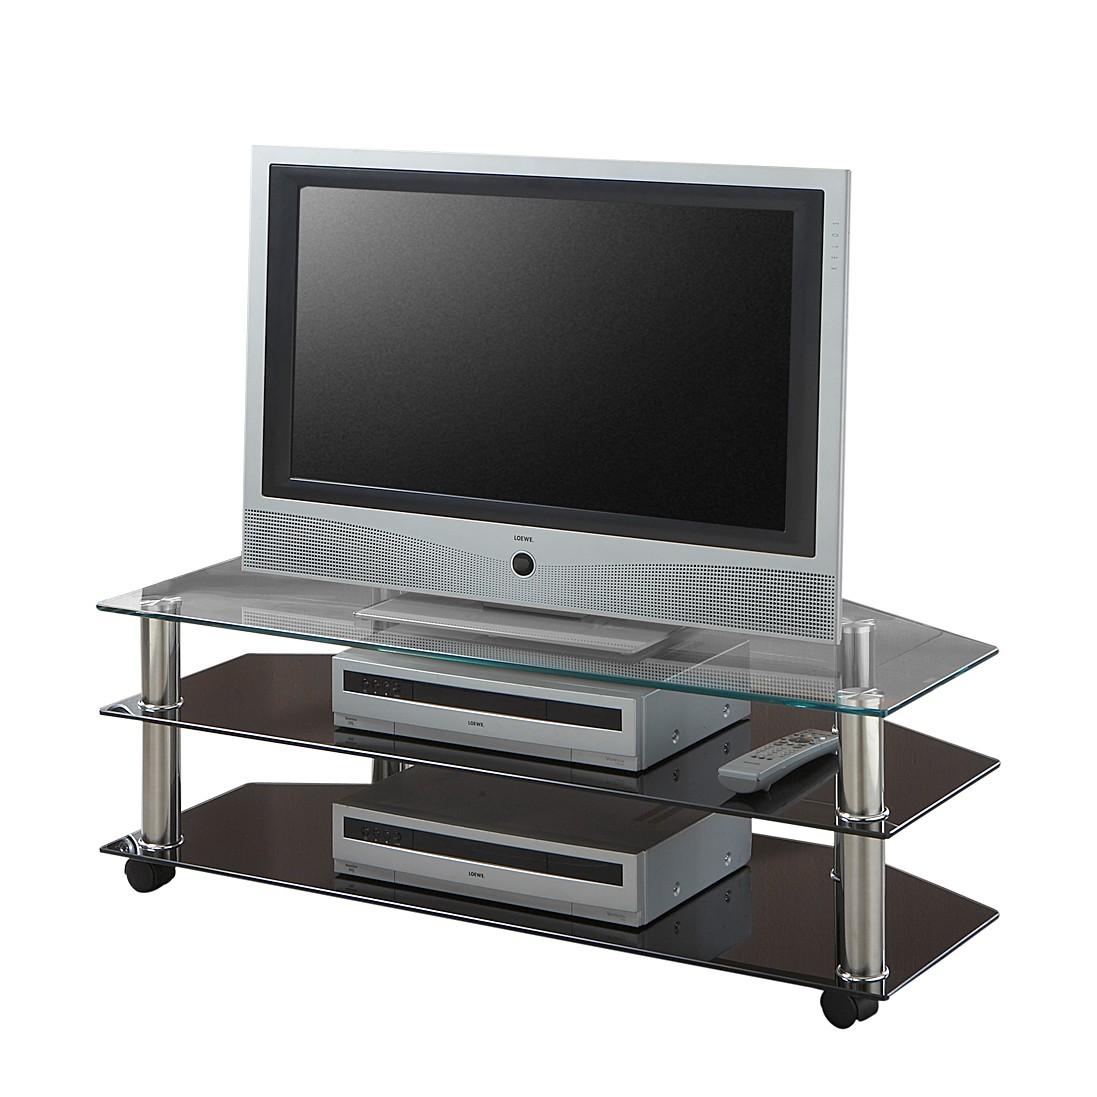 TV-Wagen Latitia - Metall/Glas - Verchromt/Schwarz & Klar